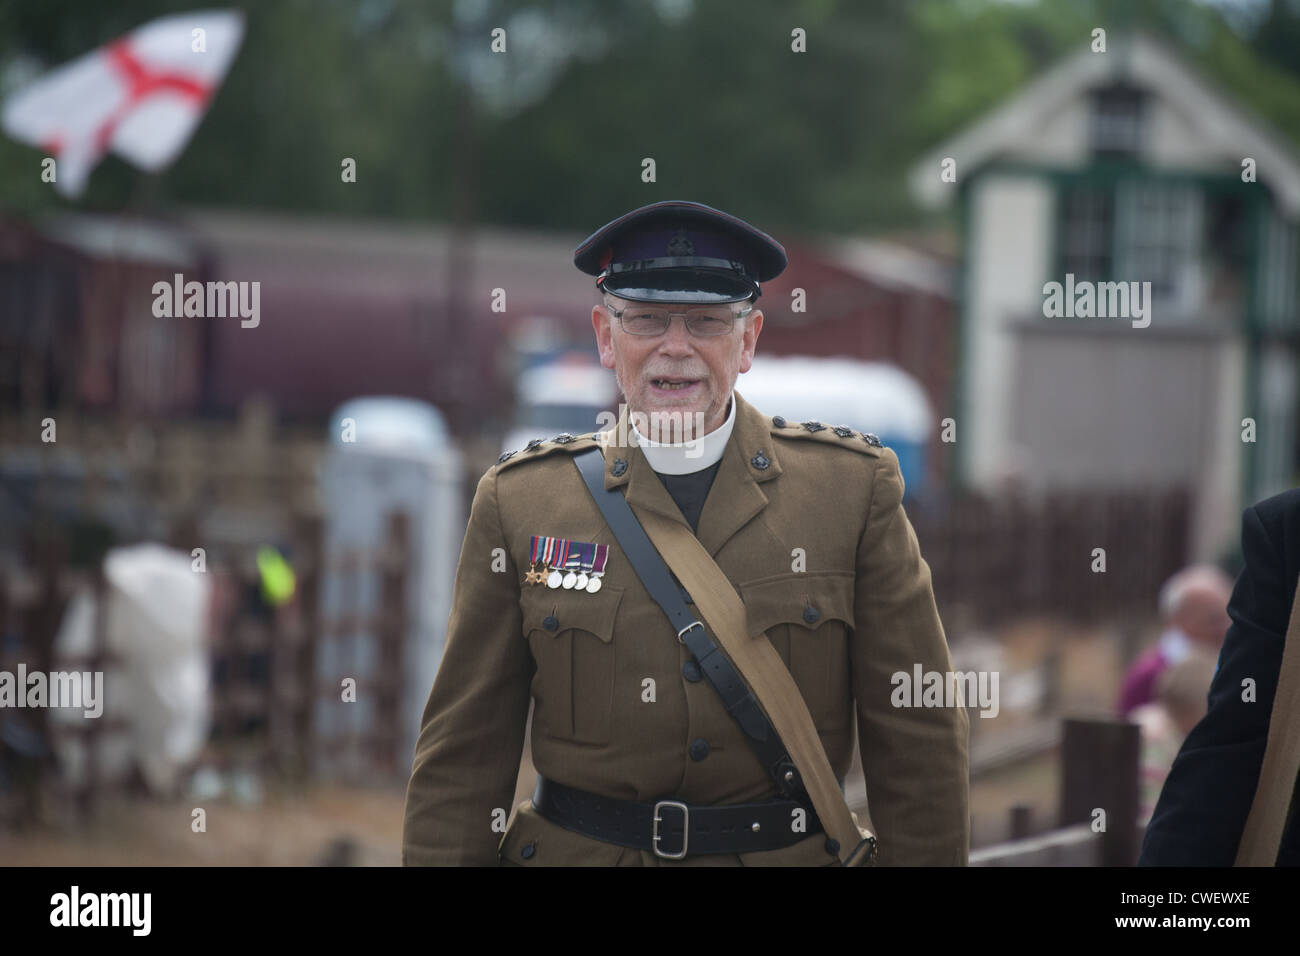 British Army Chaplain in Railway environment - Stock Image